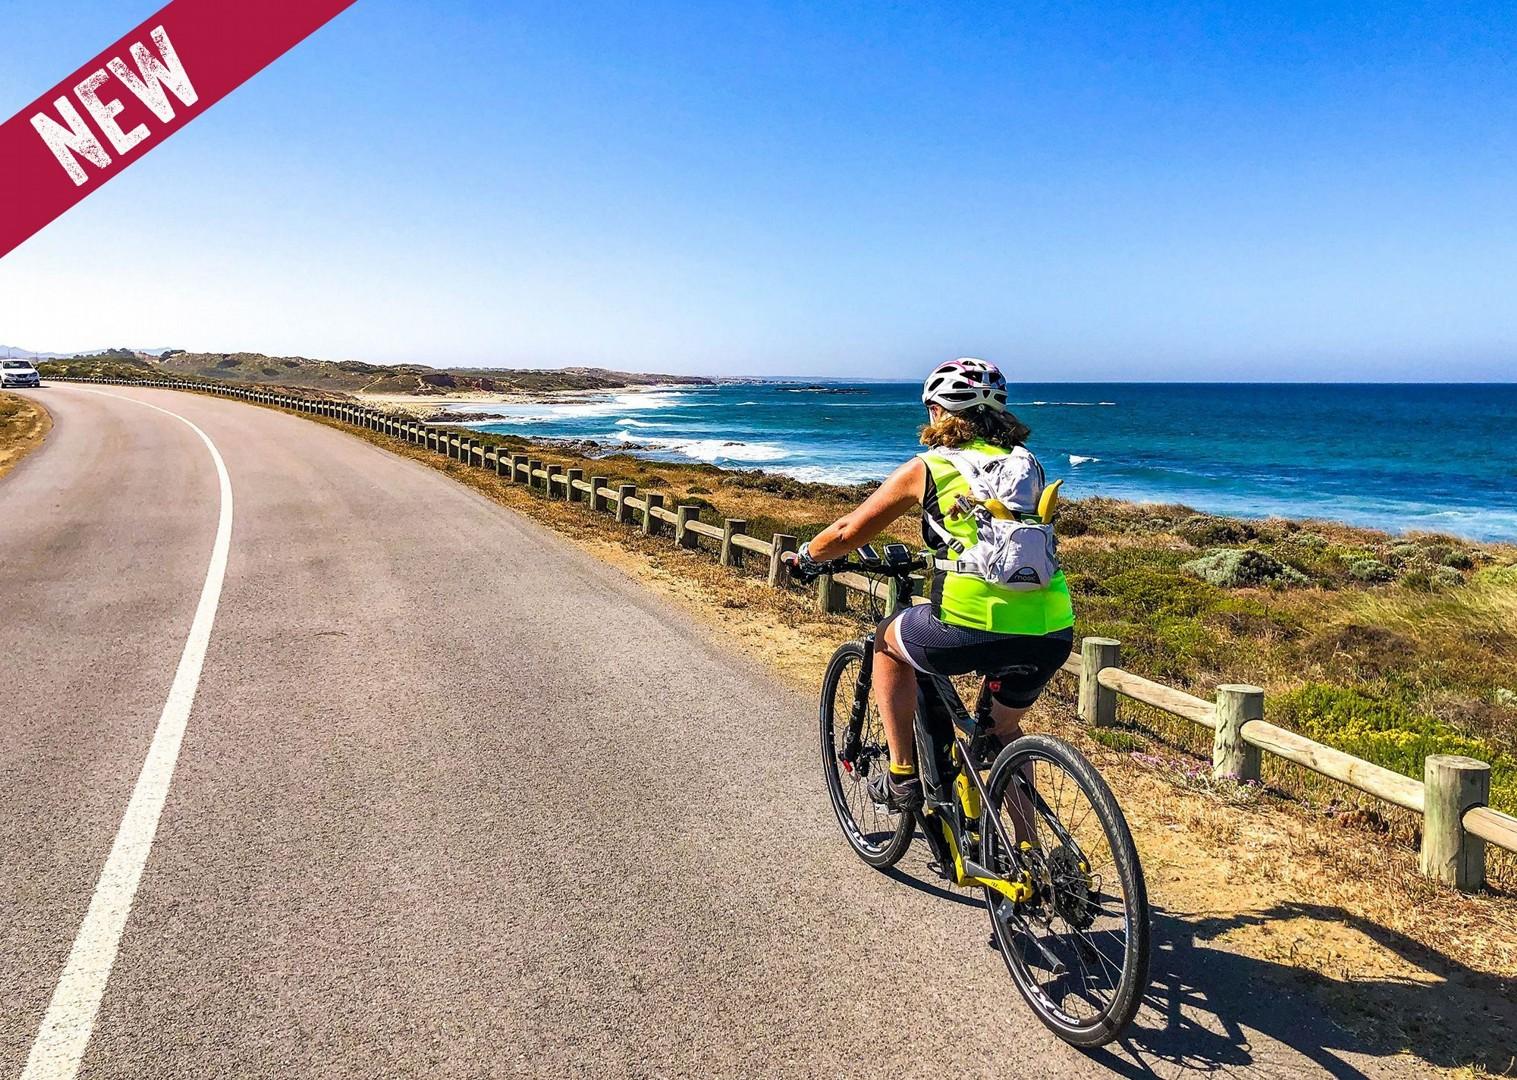 costa.jpg - Portugal - Alentejo and Algarve Coastal Explorer - Self-Guided Leisure Cycling Holiday - Leisure Cycling